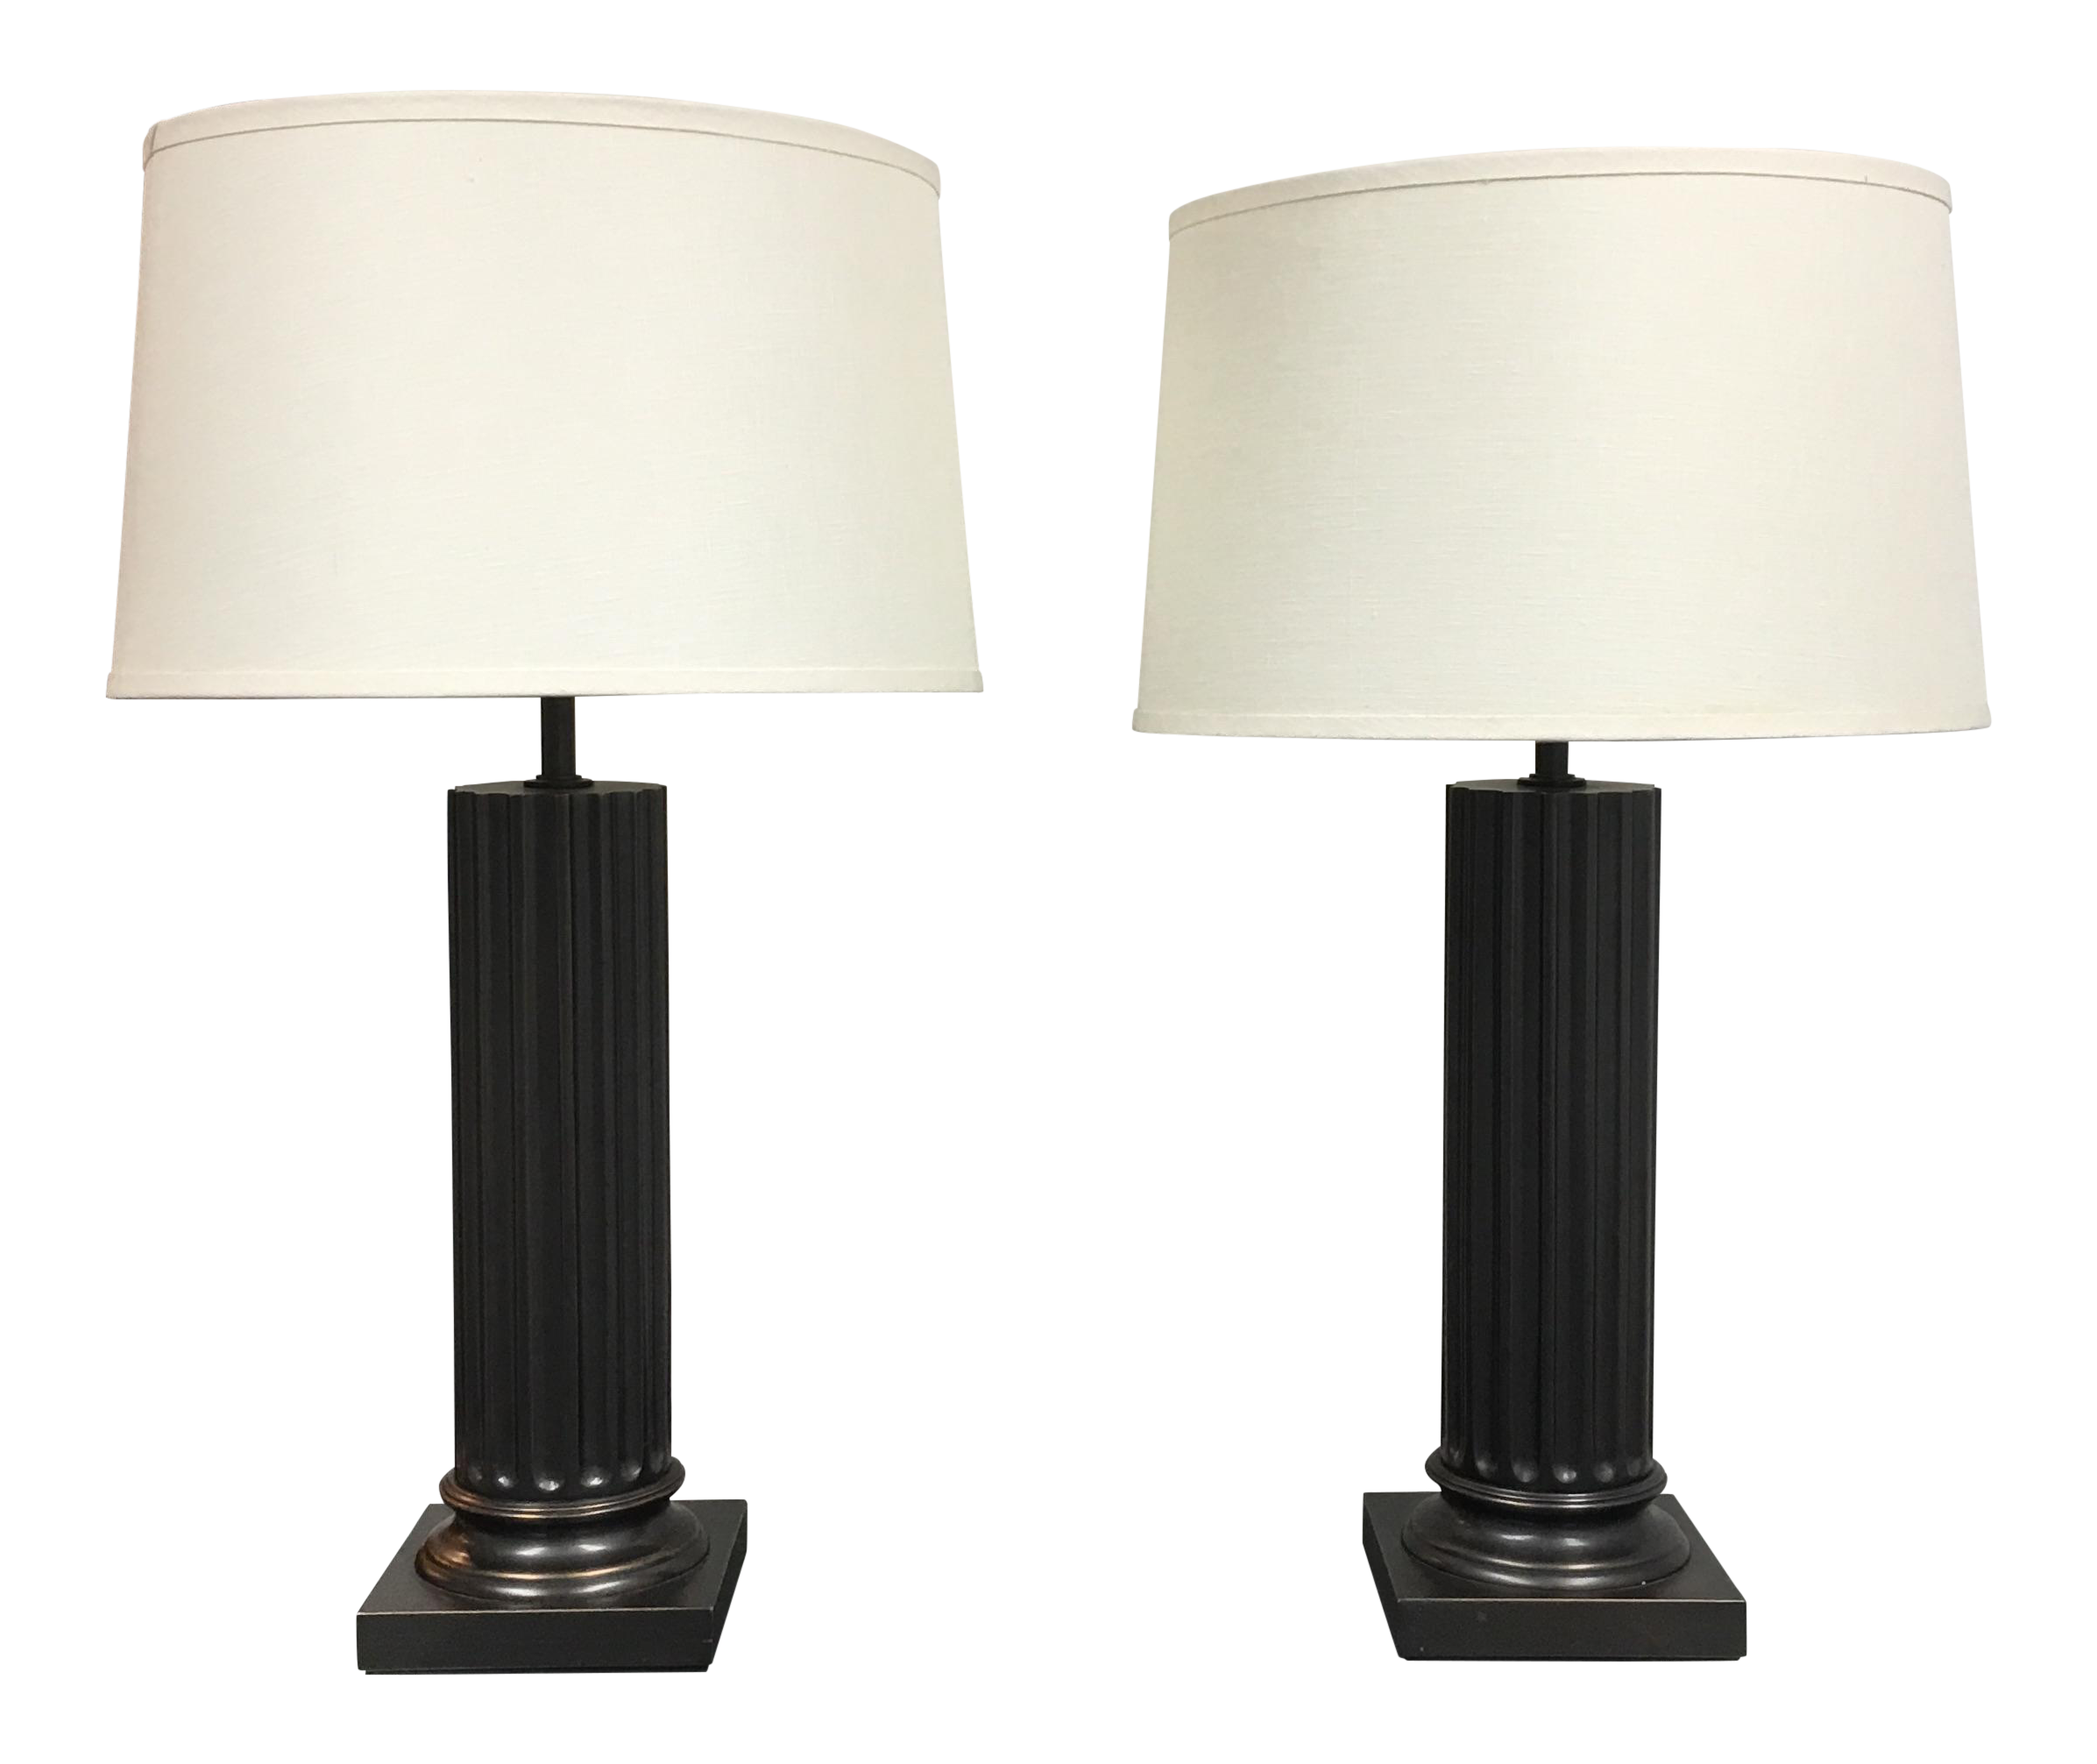 Restoration hardware column table lamps a pair chairish - Restoration hardware lamps table ...